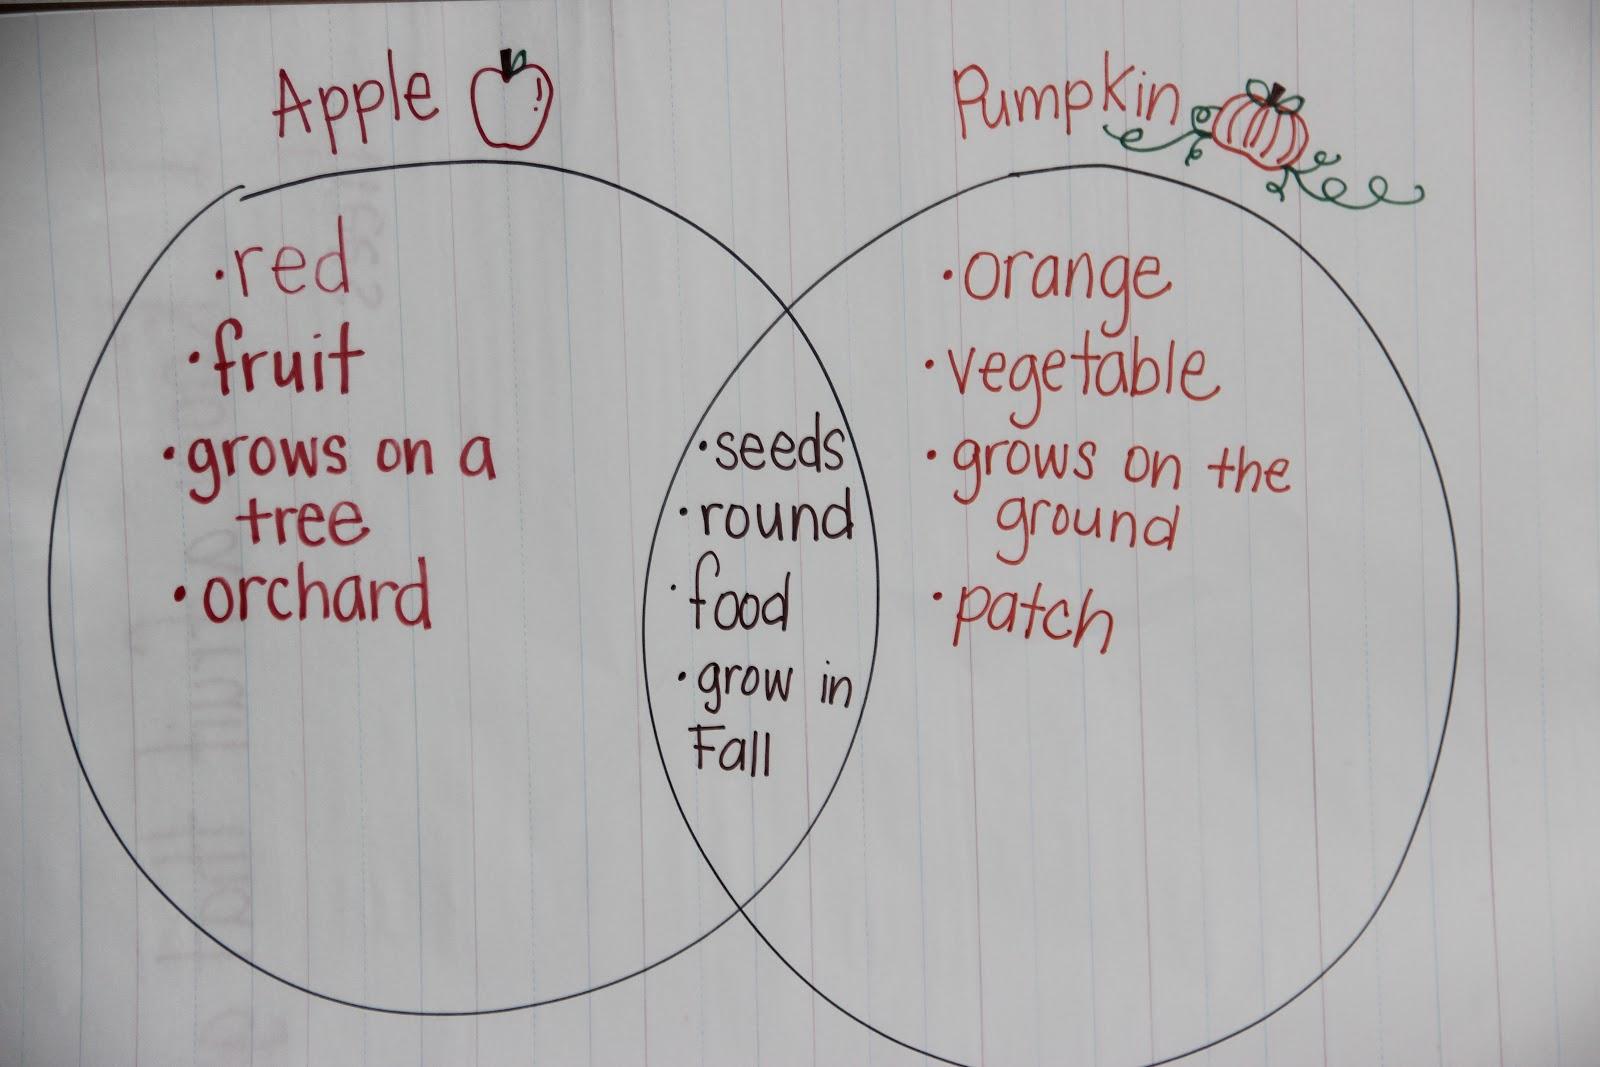 Pumpkin Diagram For Kids Made A Pumpkin Diagram